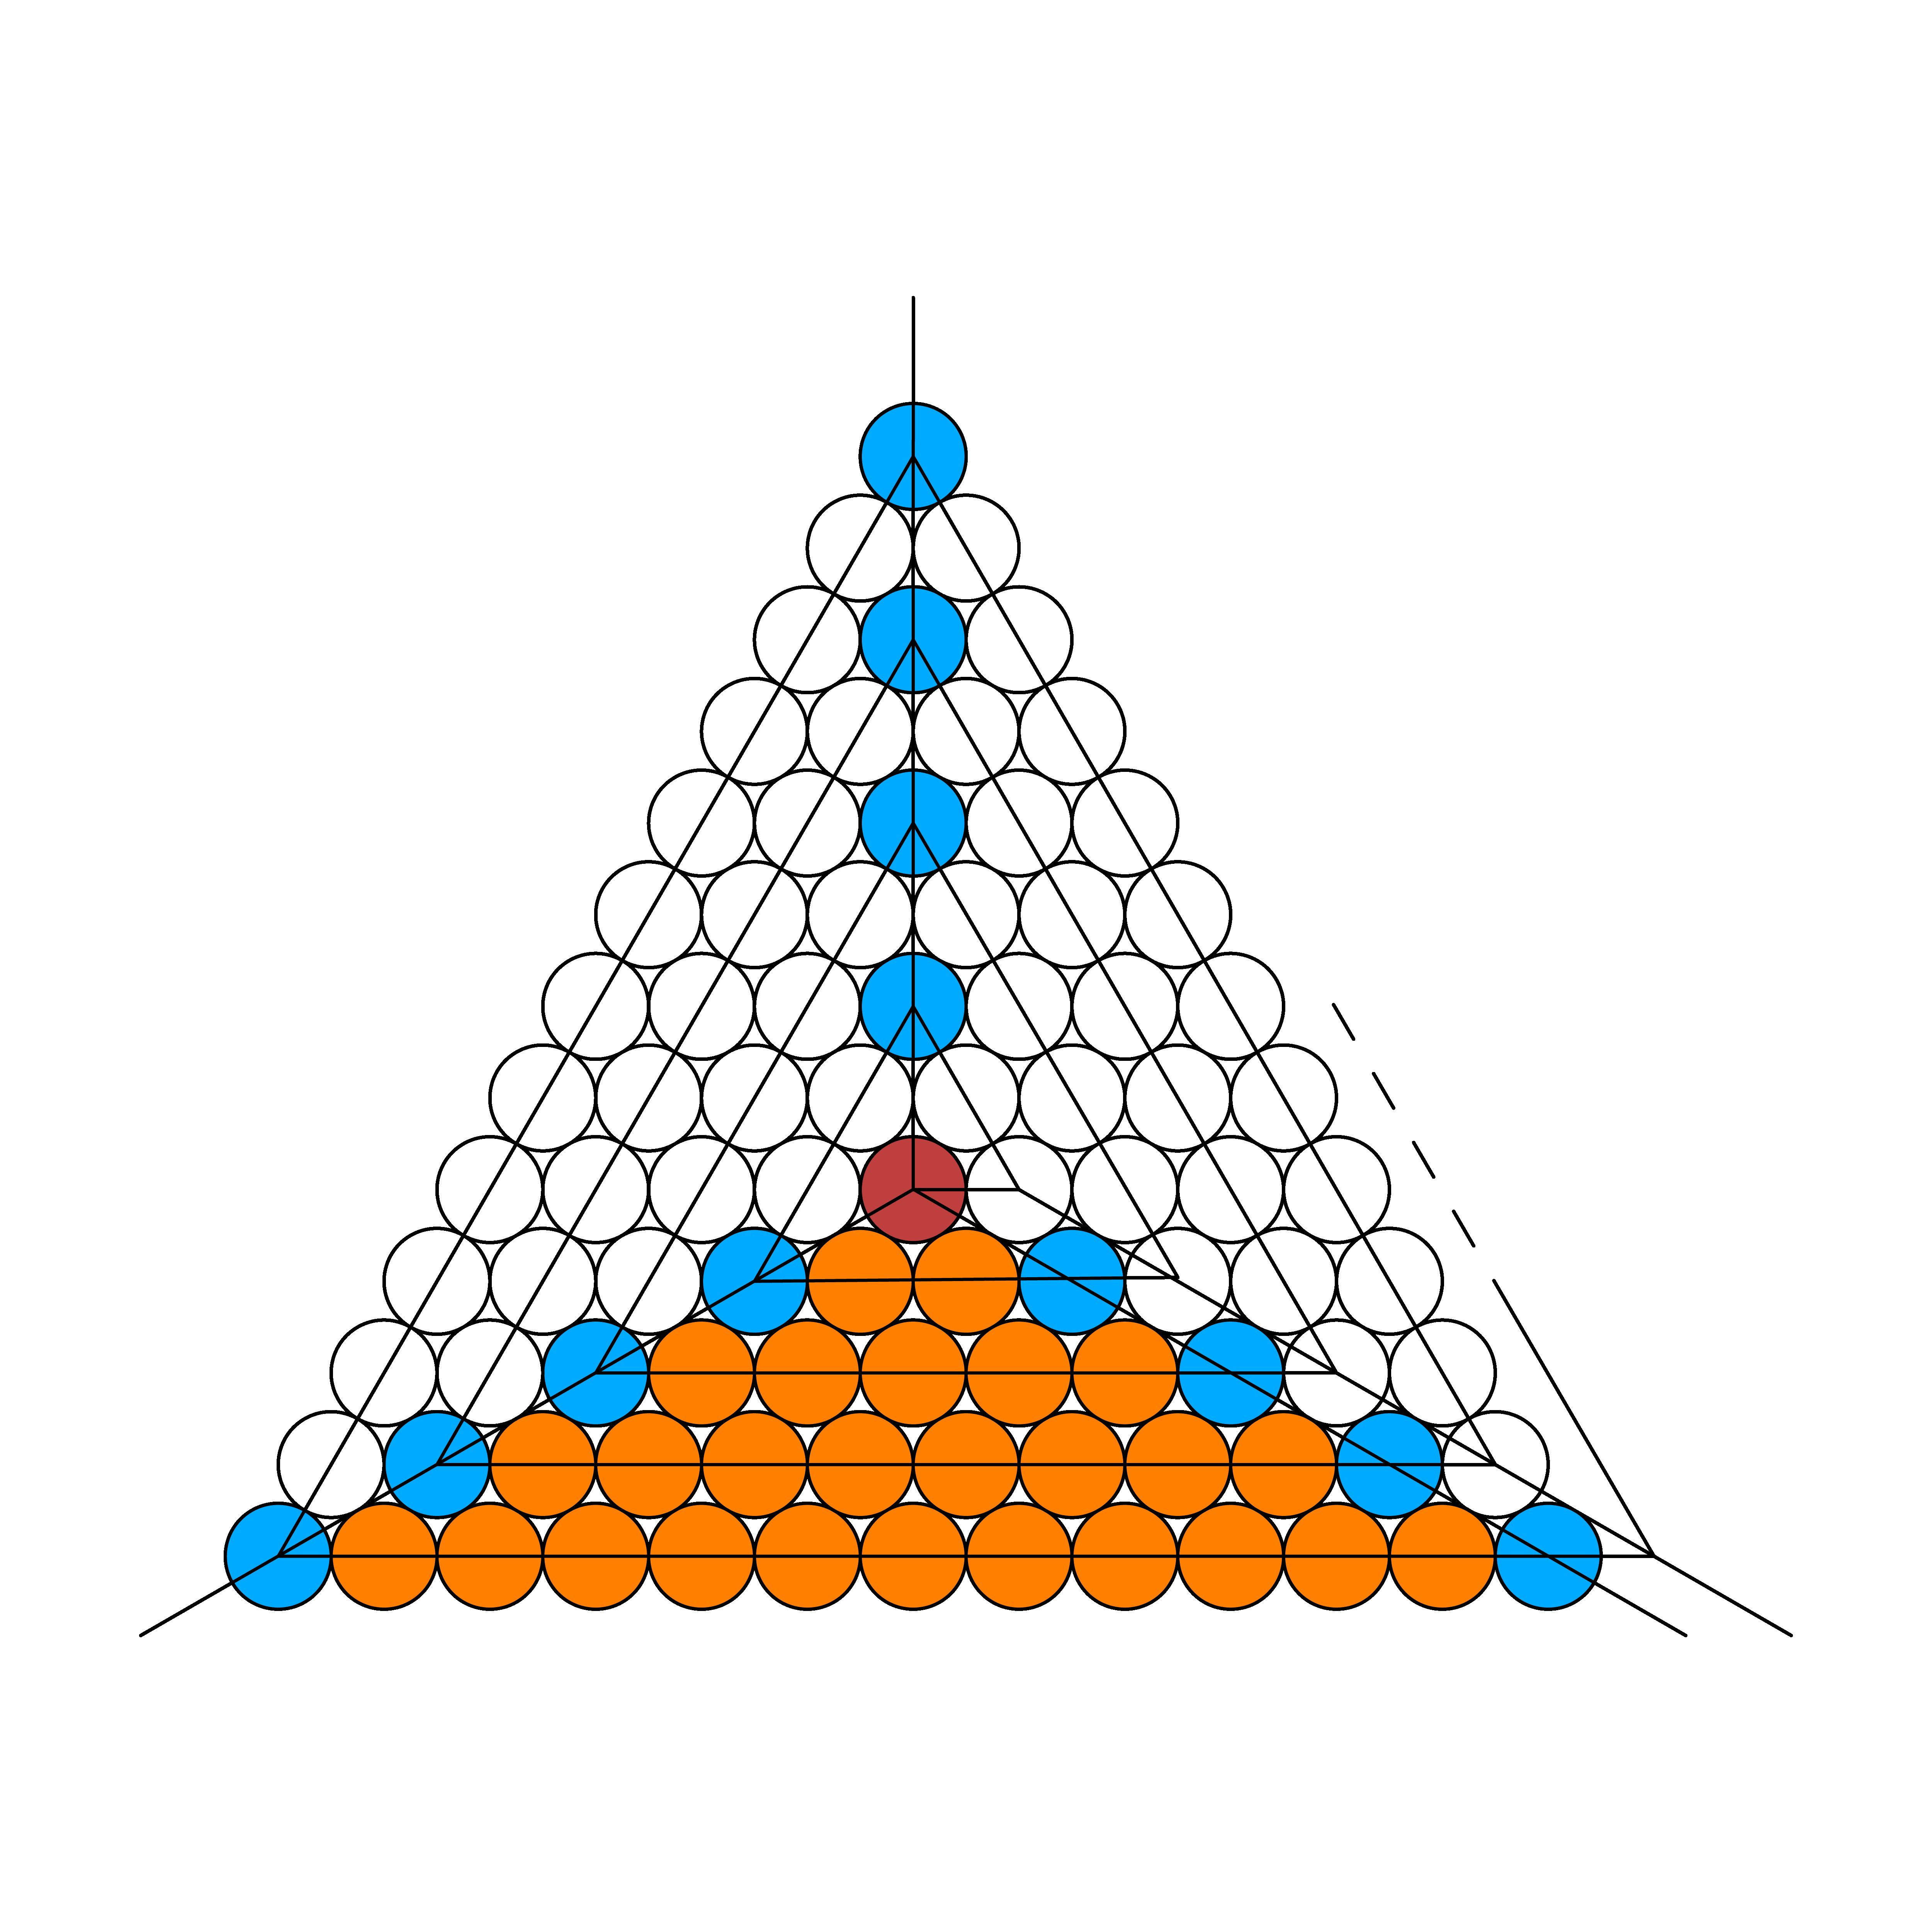 usual-type-triangular-spiral-image